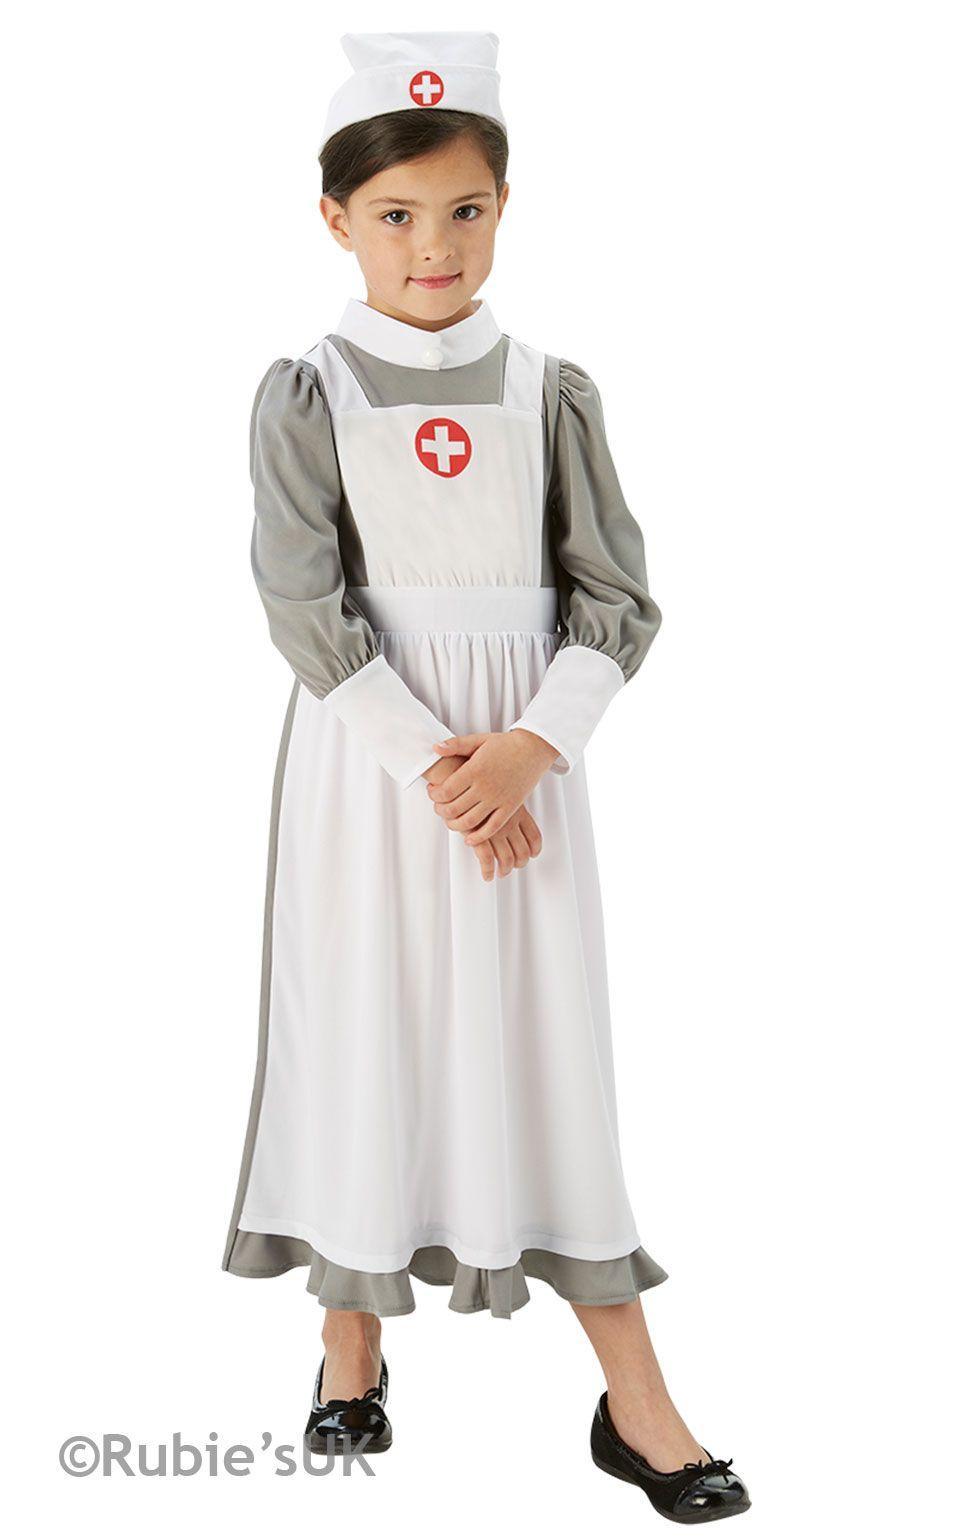 d4ec0a9128f04 girls nurses costumes WW1 costumes florence nightingale costumes ...